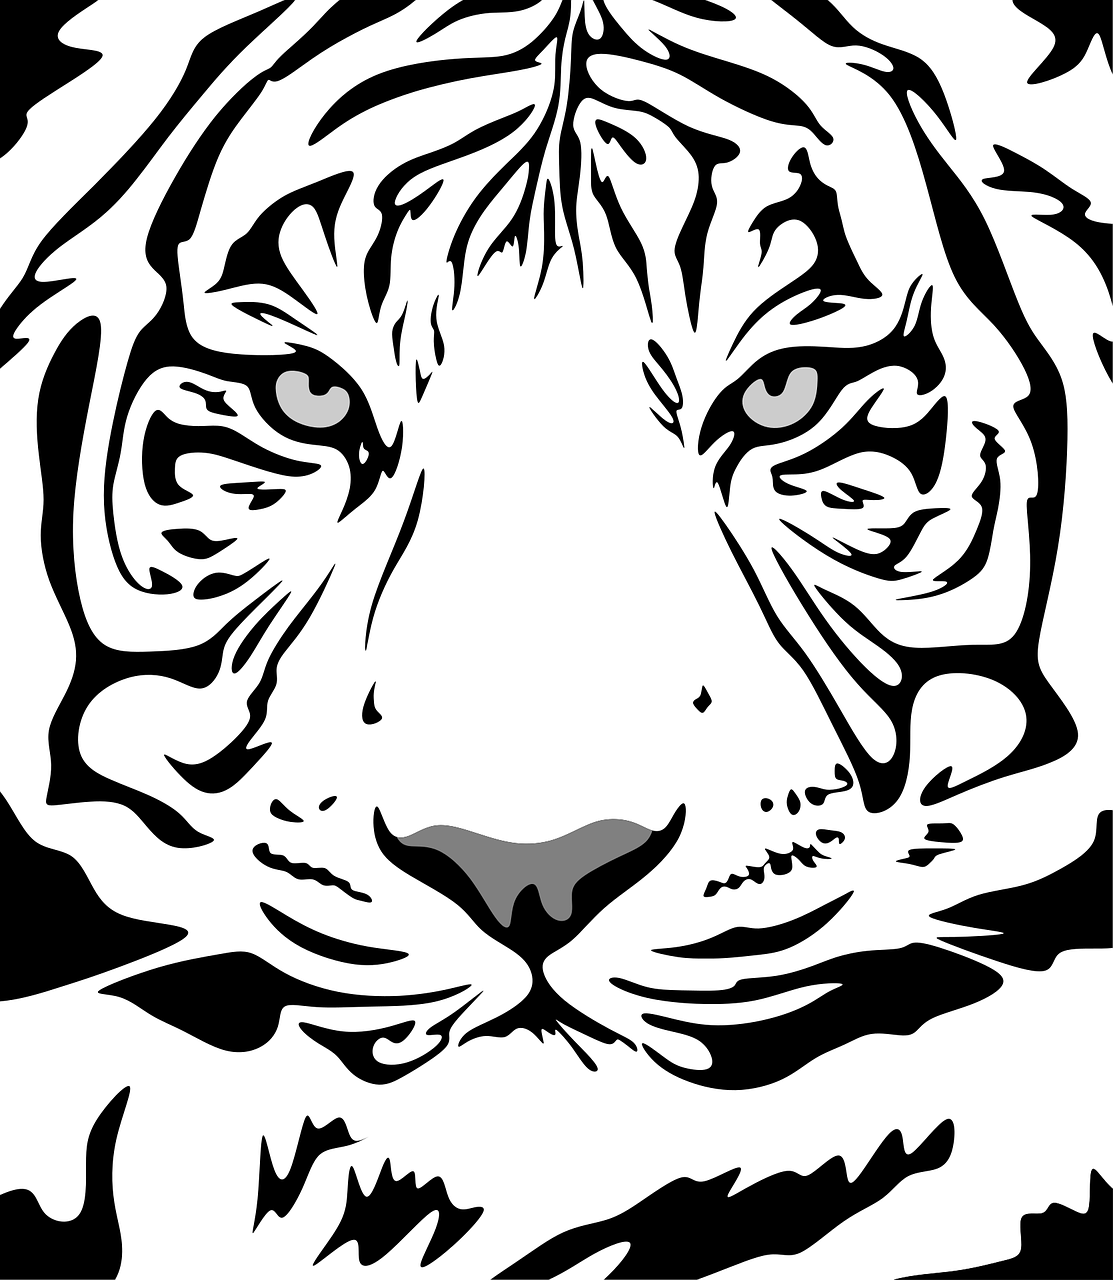 Tiger, Tiger - Tyger, Tyger